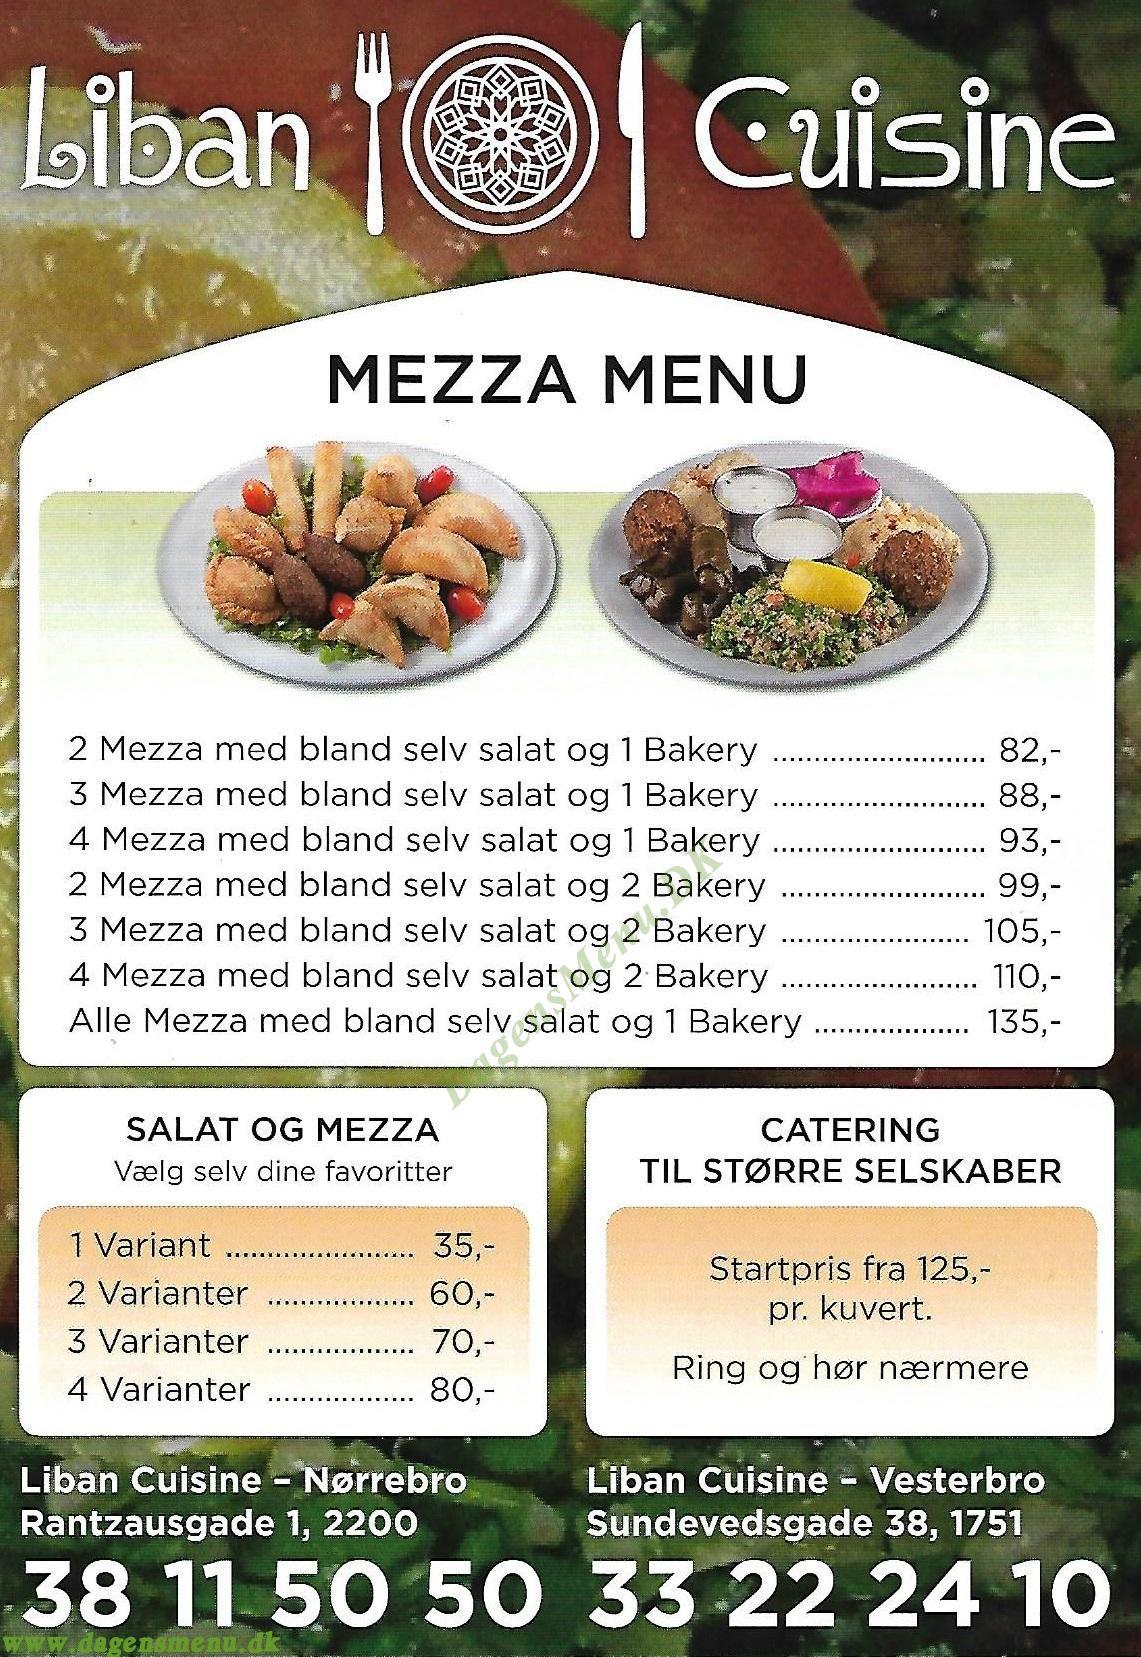 Liban Cuisine Vesterbro - Menukort